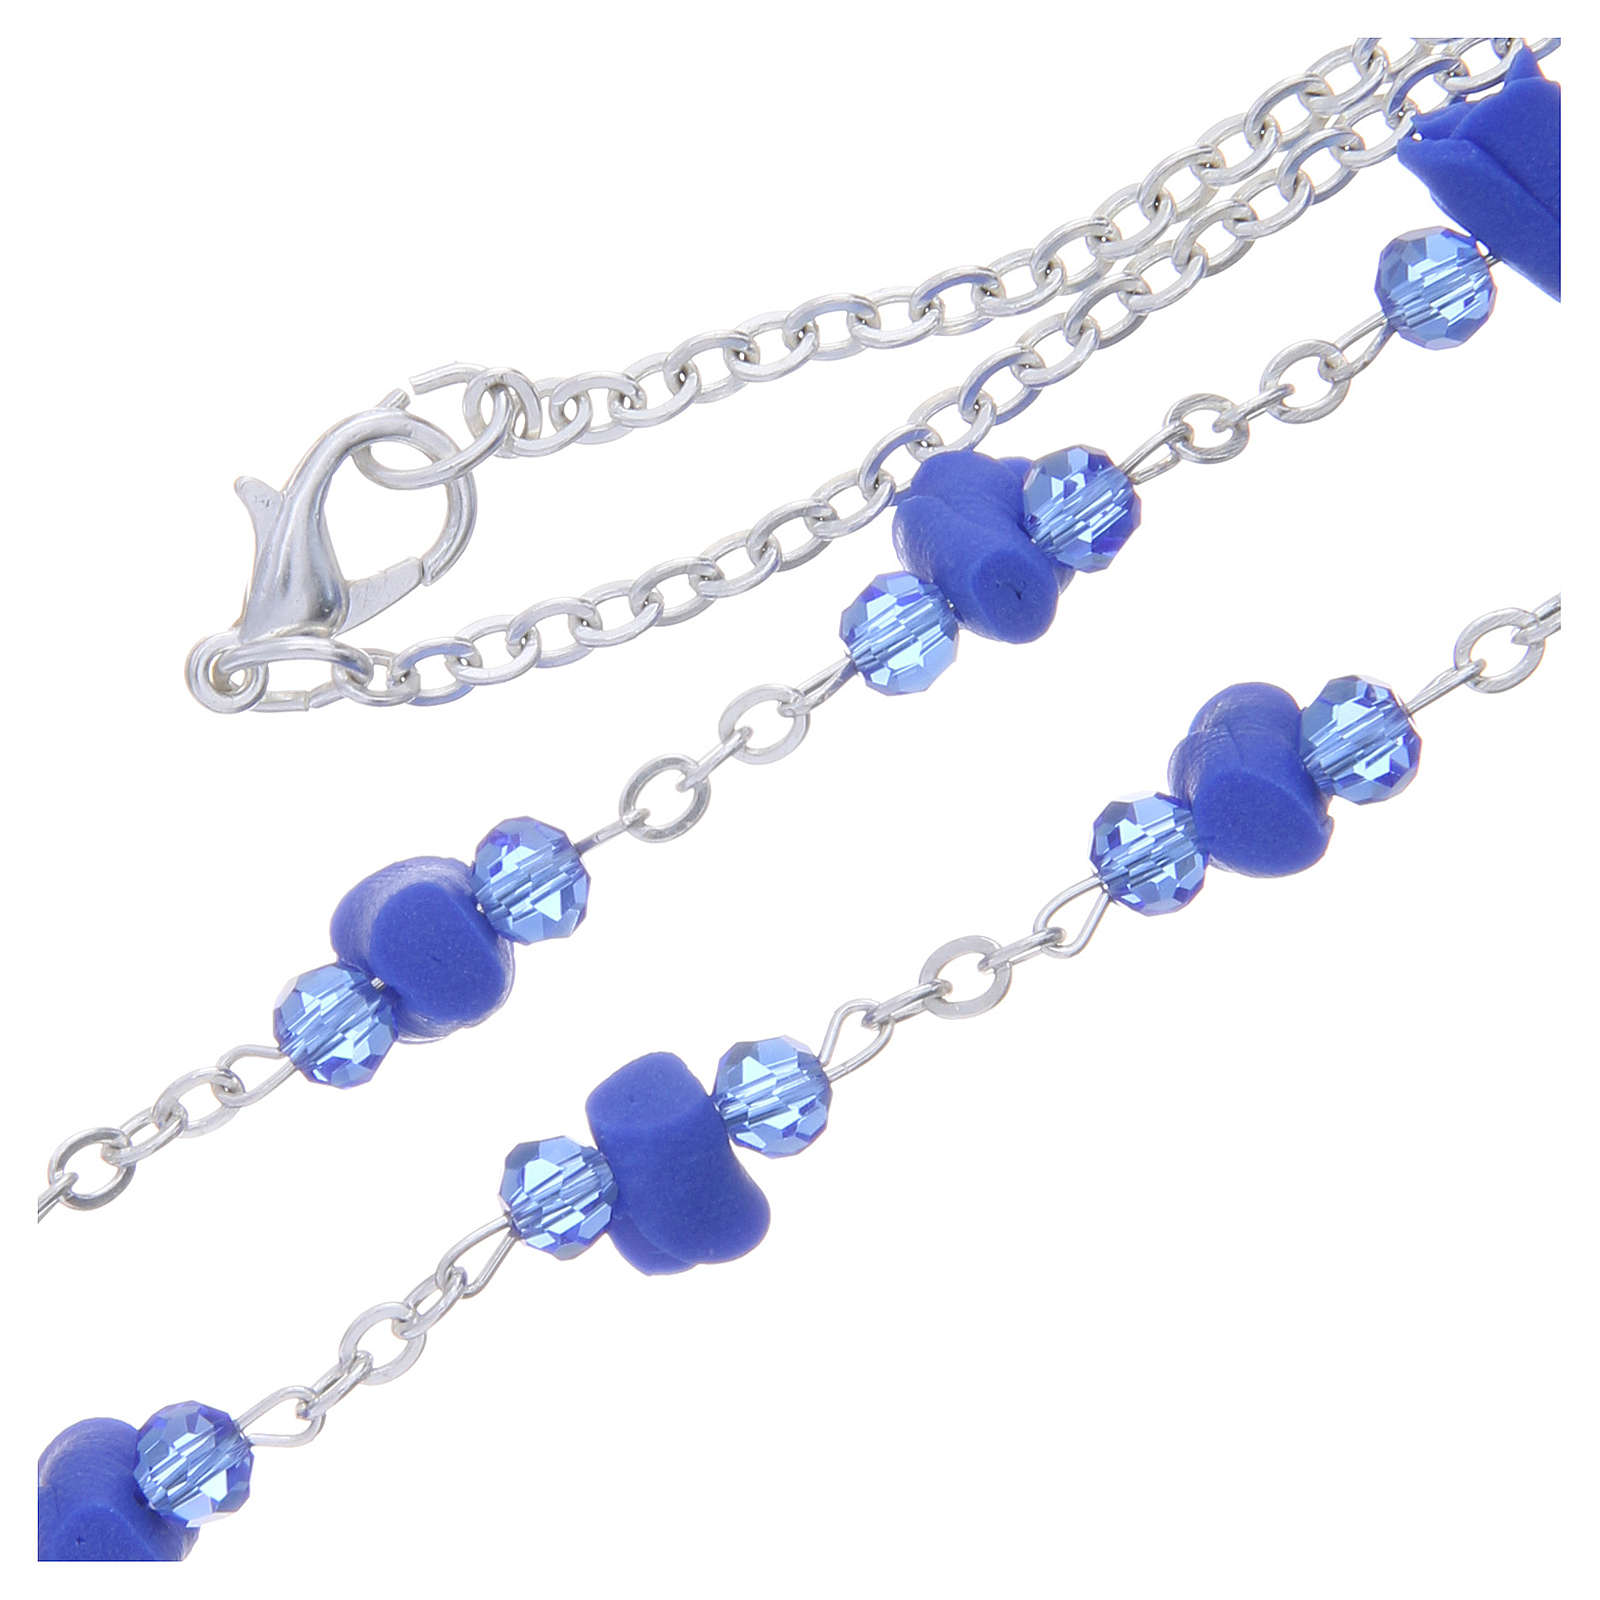 Collier chapelet Medjugorje roses bleues céramique icône Vierge 4